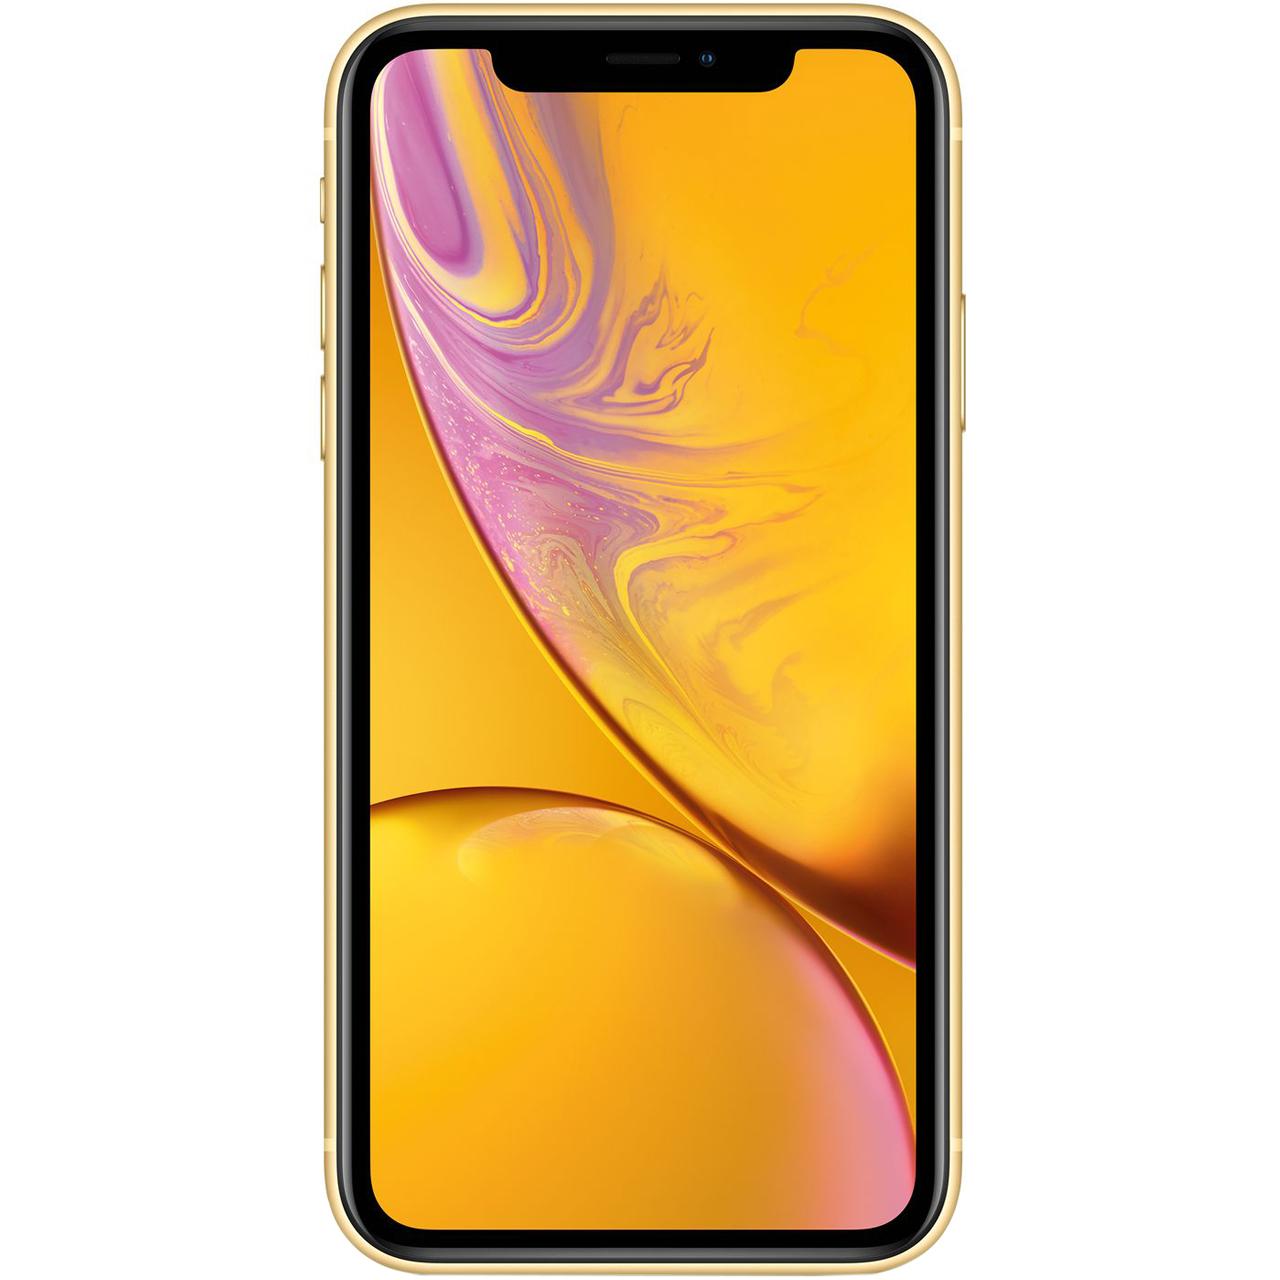 گوشی موبایل اپل مدل iPhone XR دو سیم کارت ظرفیت 64 گیگابایت | Apple iPhone XR Dual SIM 64GB Mobile Phone